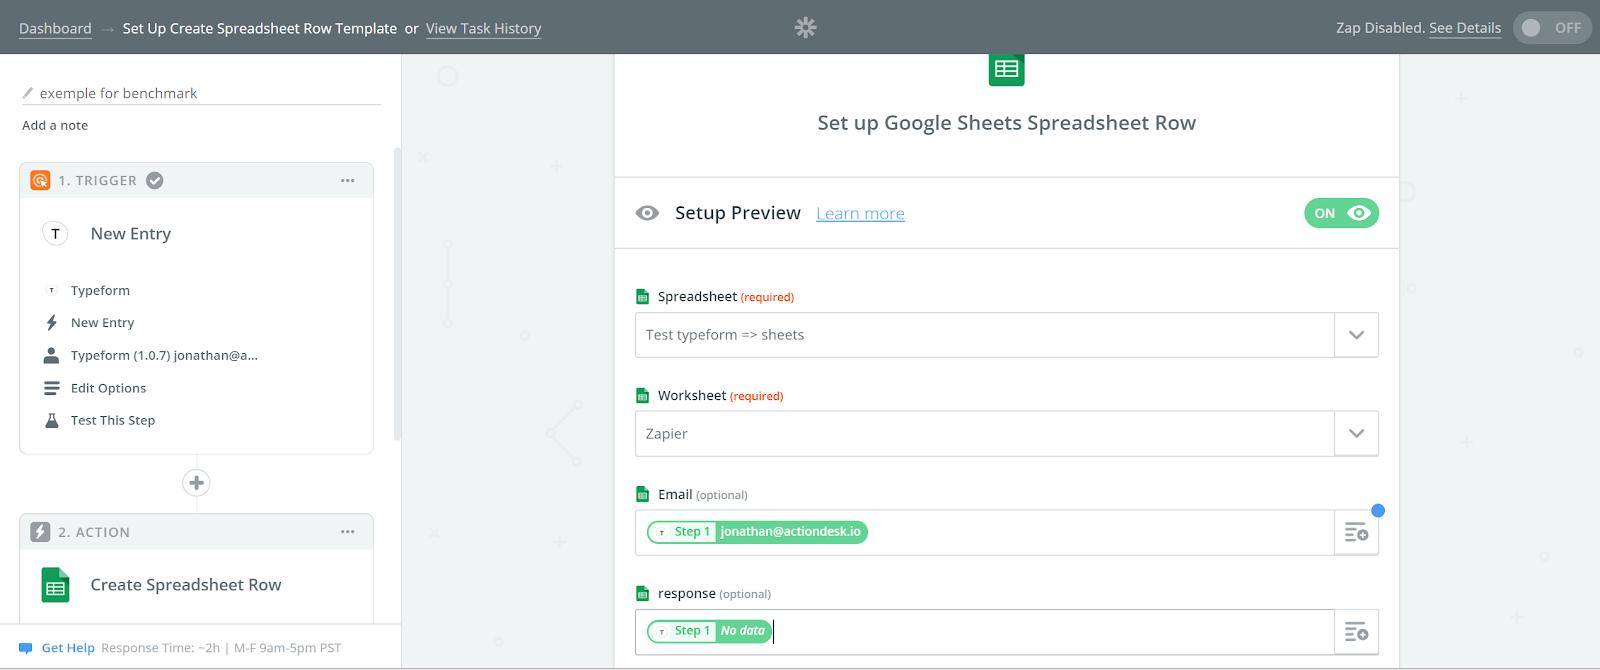 9 alternatives to Zapier for startups & SMBs - A benchmark